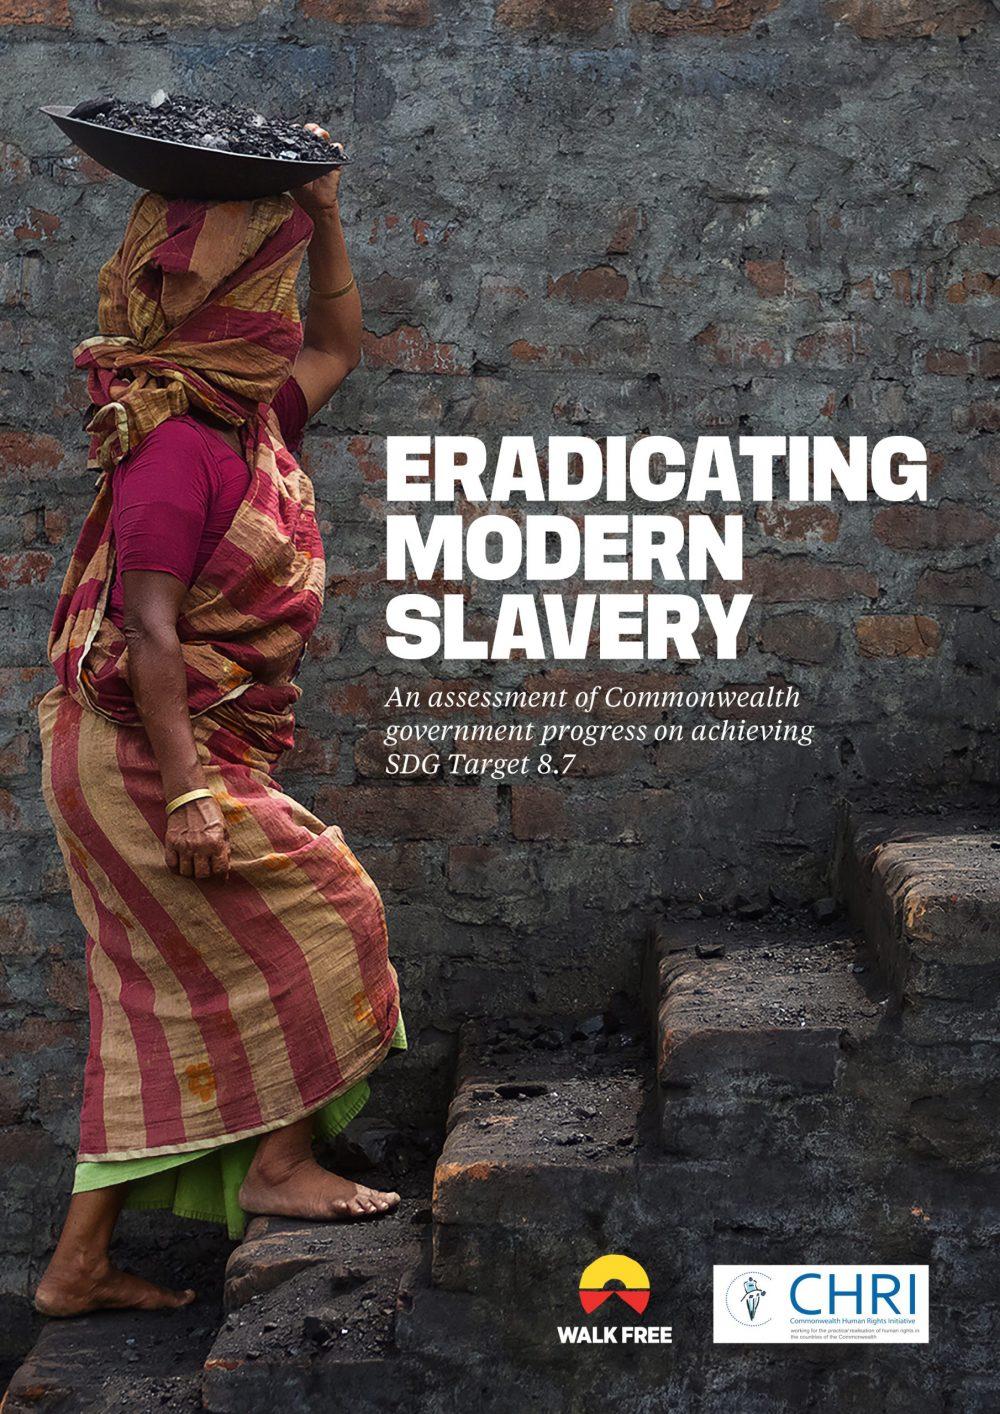 Eradicating Modern Slavery